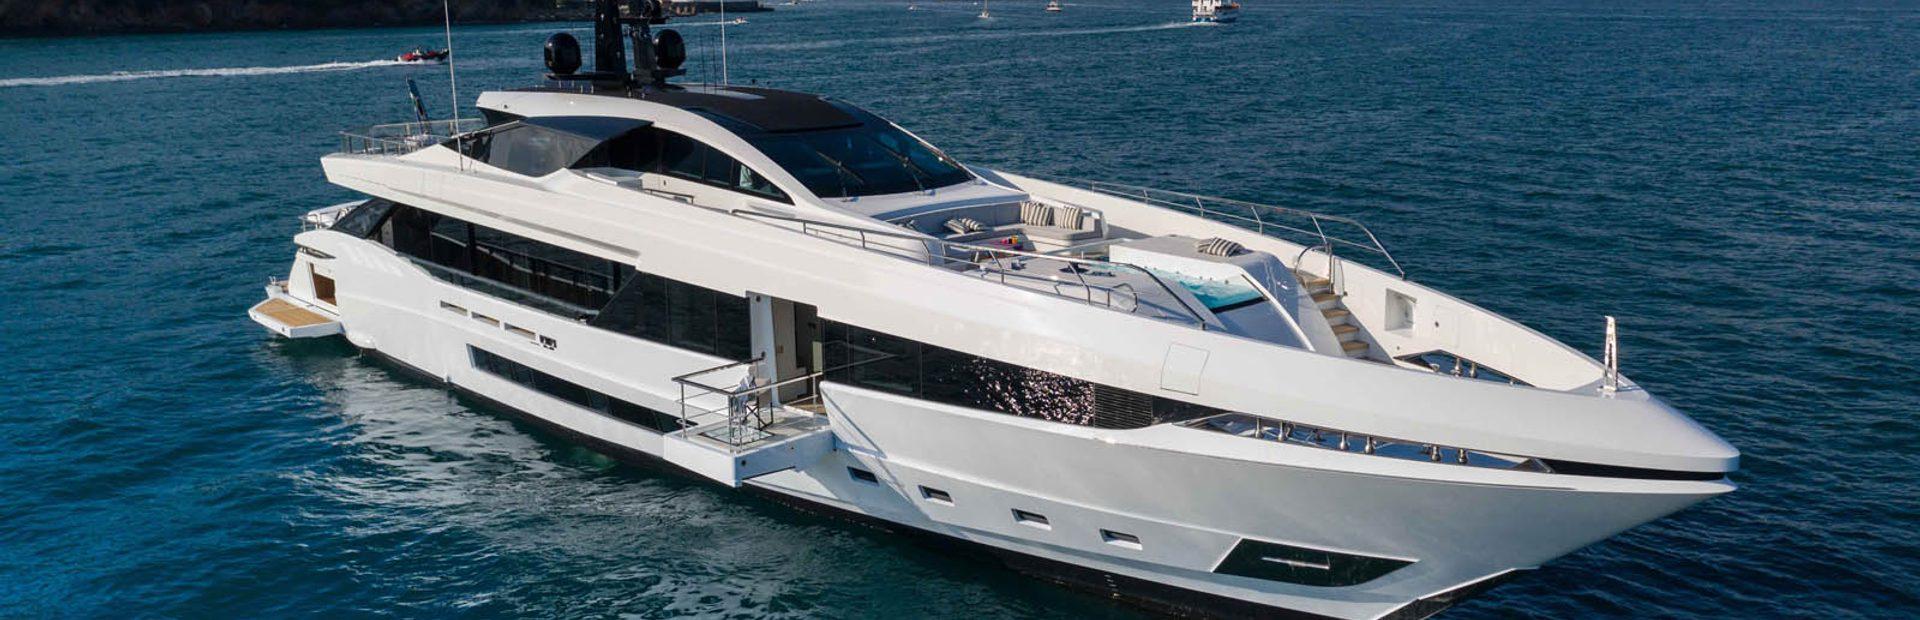 Mangusta GranSport 45 Yacht Charter